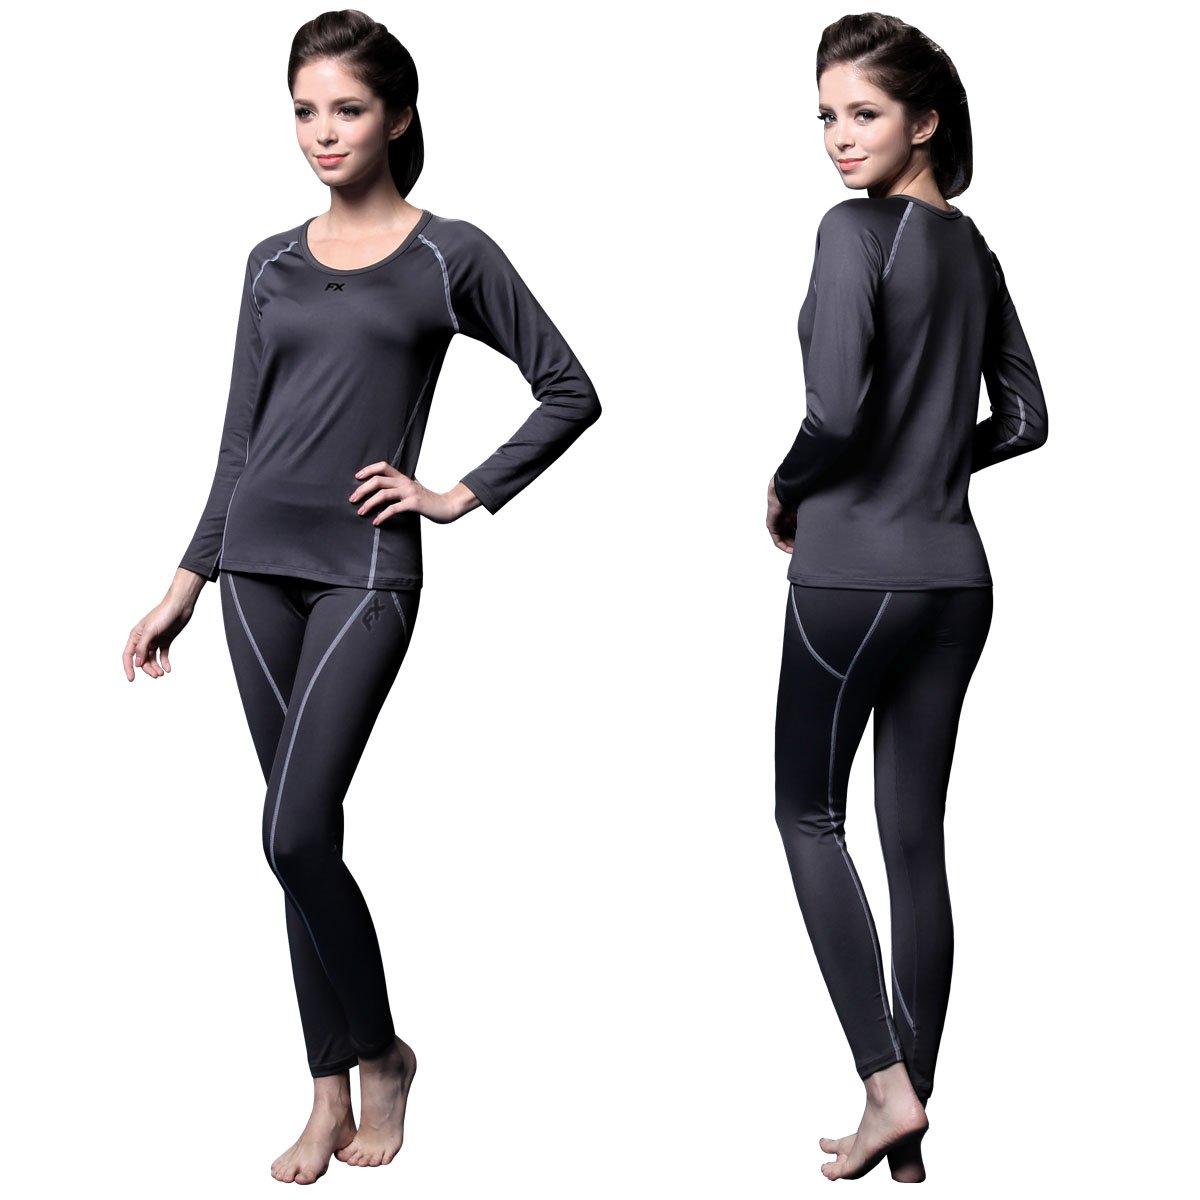 FITEXTREME Womens MAXHEAT Fleece Long Johns Thermal Underwear Set Grey S